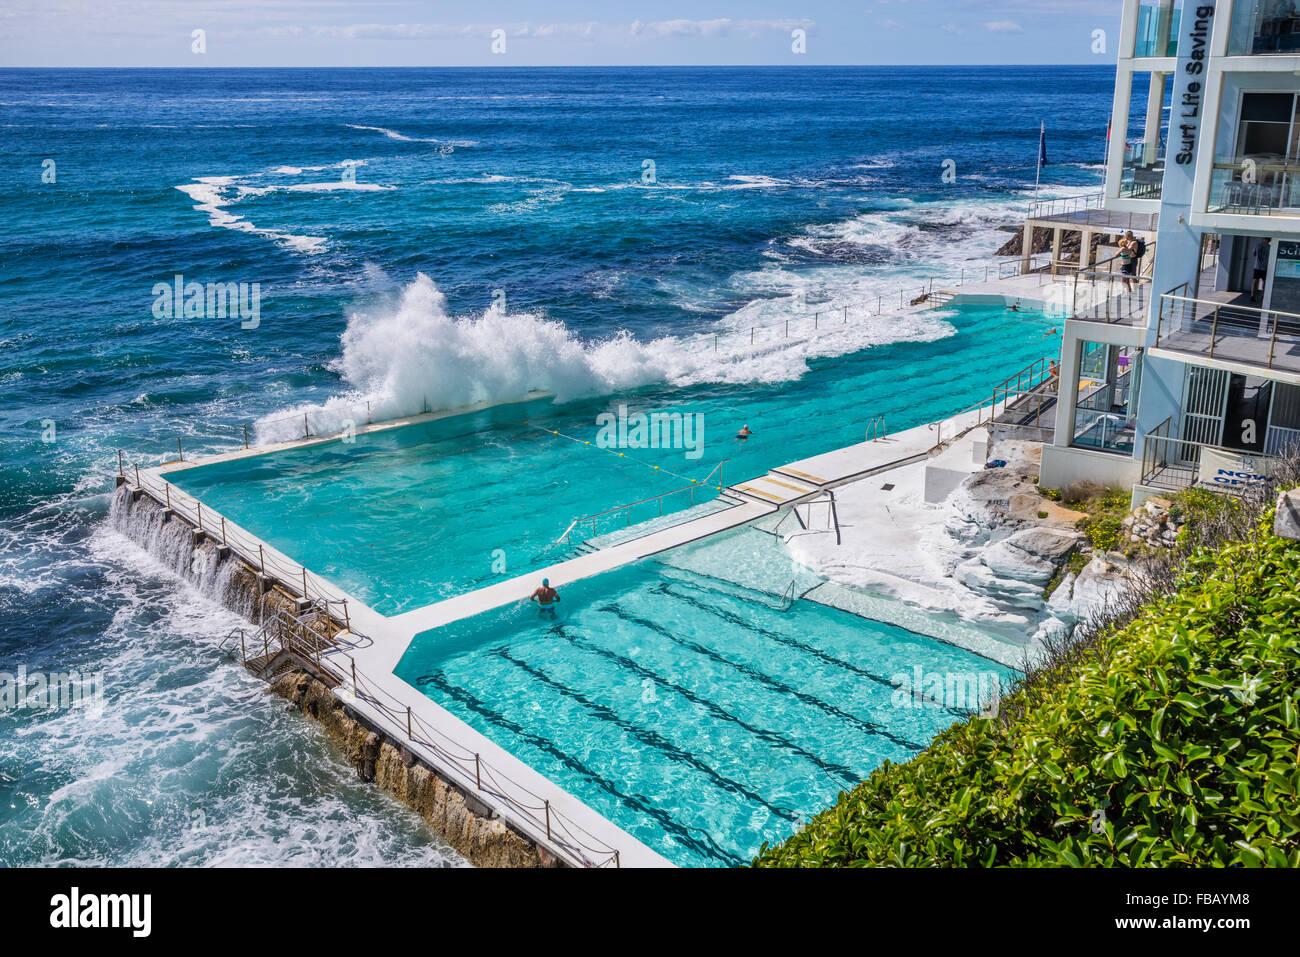 Waves Crashing Into The Swimming Pool Of The Bondi Icebers Swimming Stock Photo 93054312 Alamy